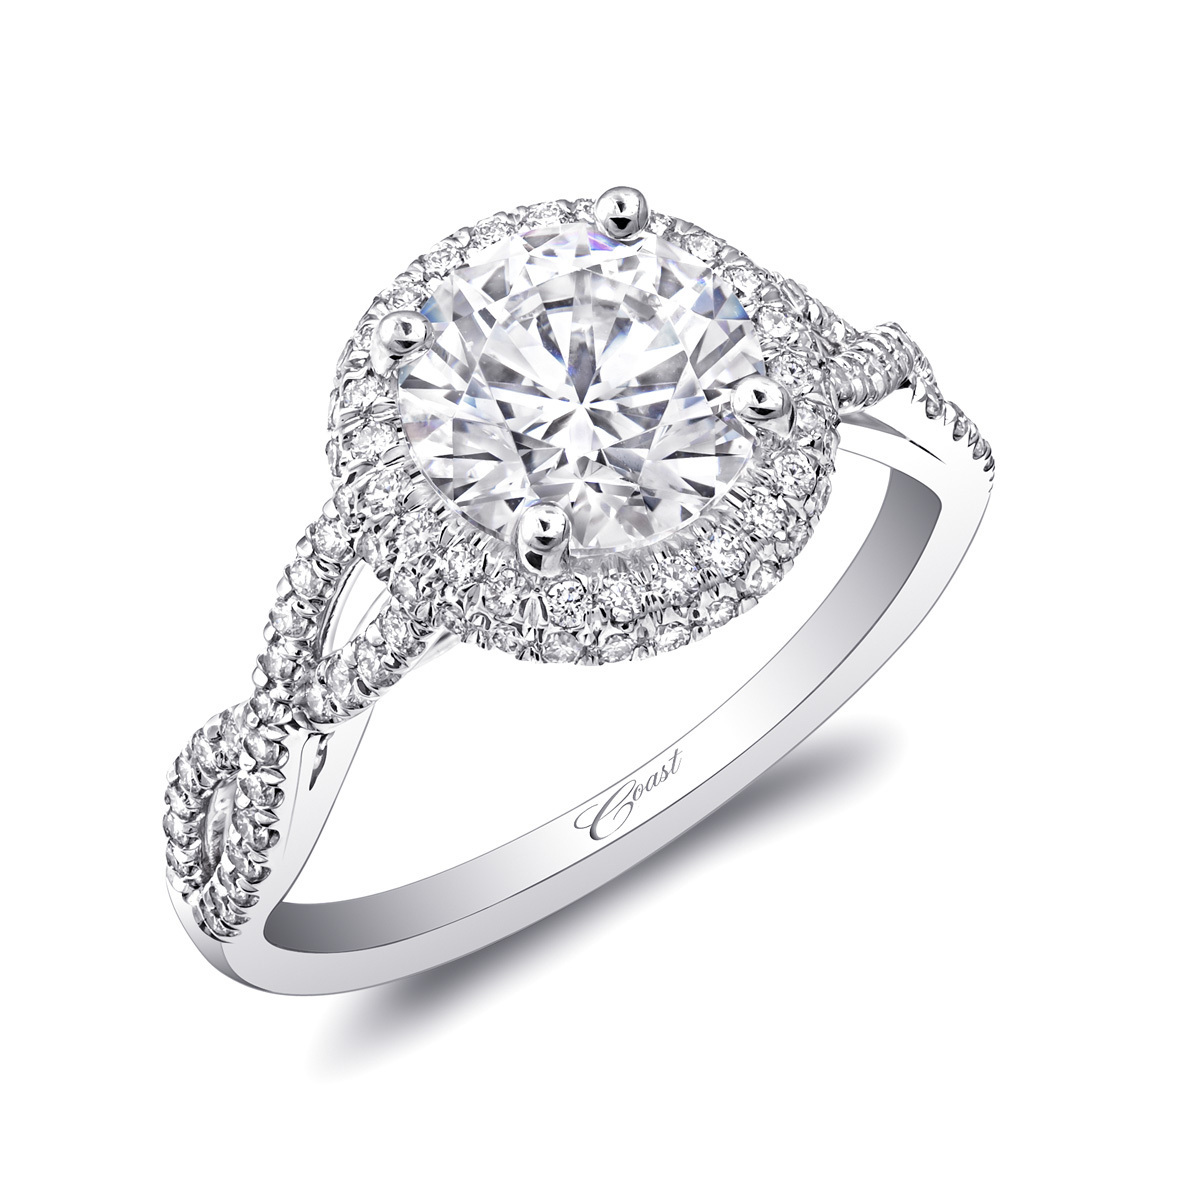 Charisma Engagement Ring - Diamond Halo & Braided Shank